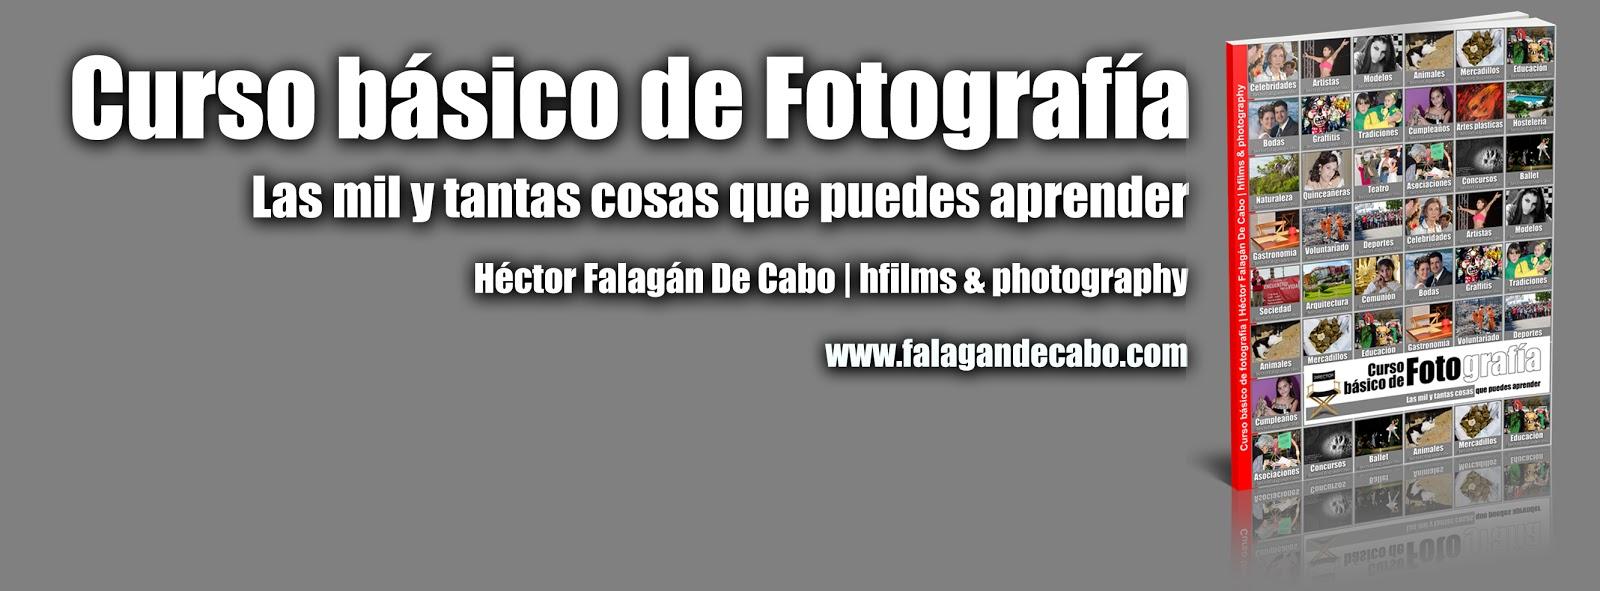 Curso básico de Fotografía - promoción - Héctor Falagán De Cabo.